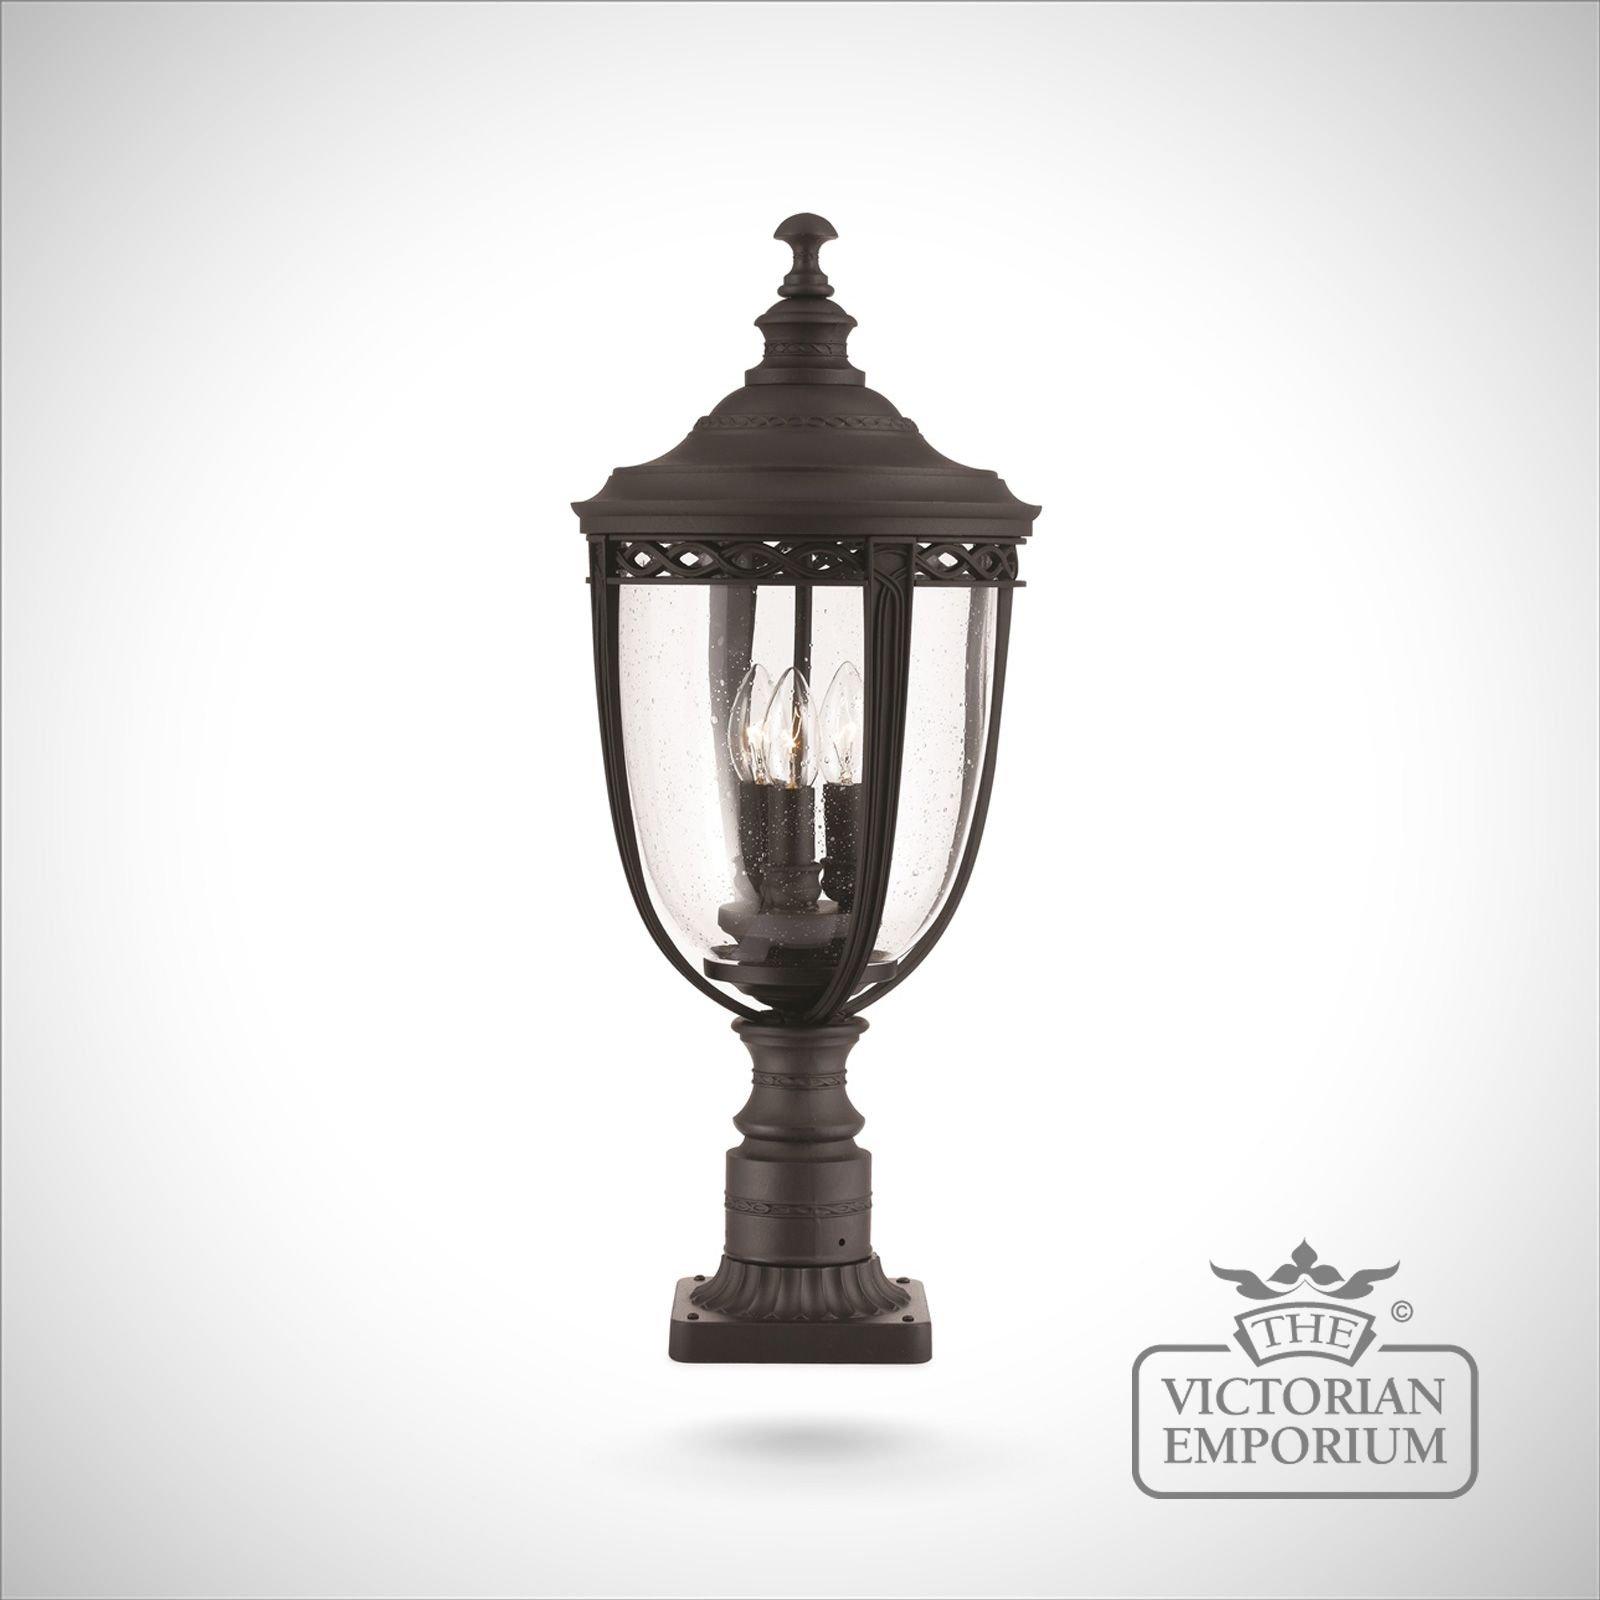 Bedfords Medium Pedestal Lantern In Black: Bridle Medium Pedestal Lamp In Black